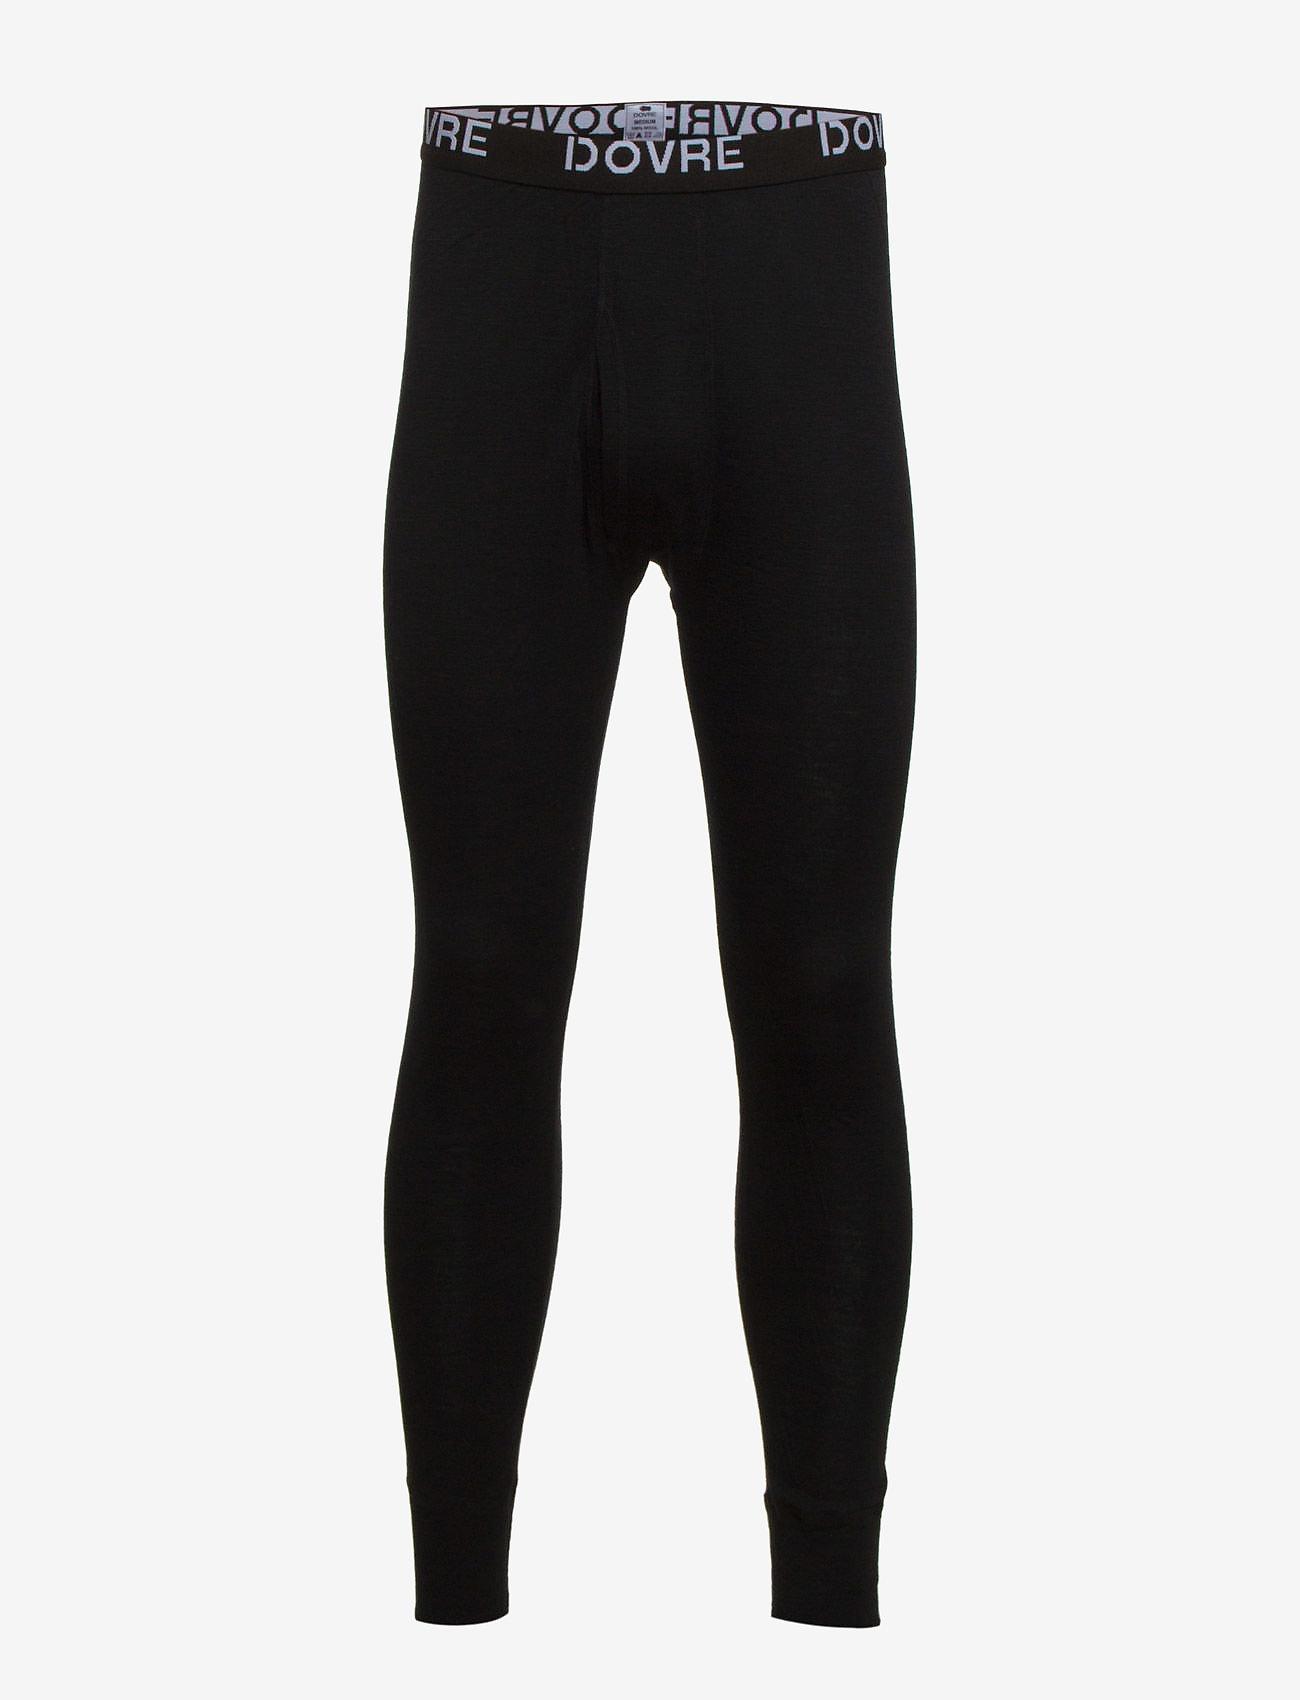 Dovre - Dovre Wool Long Johns - base layer bottoms - sort - 0